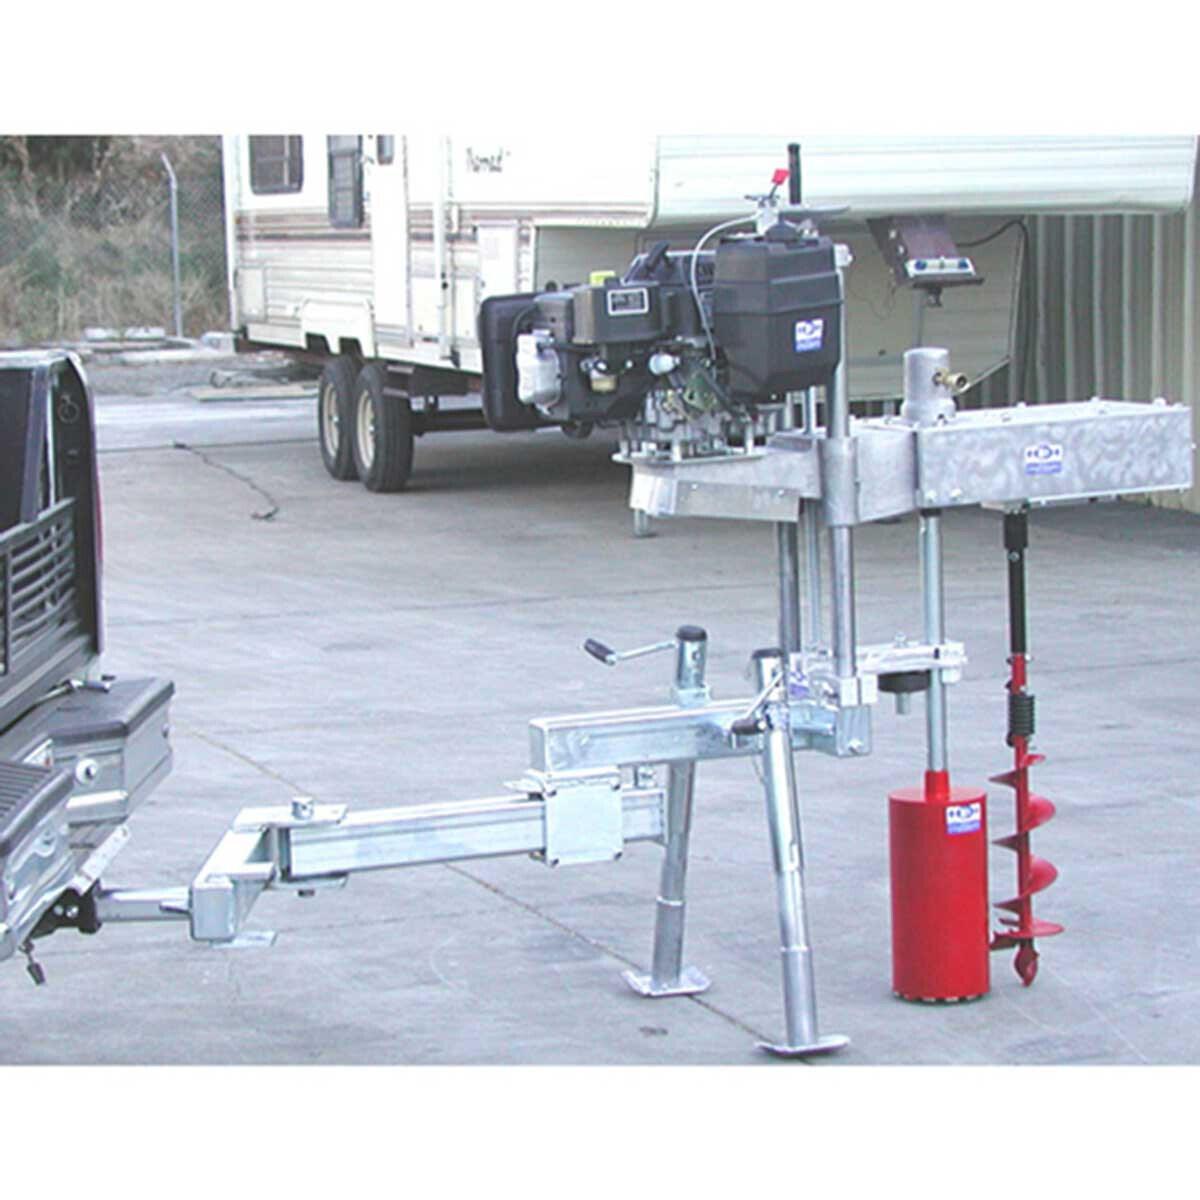 Kor-It K-1700 Mounted Drilling System